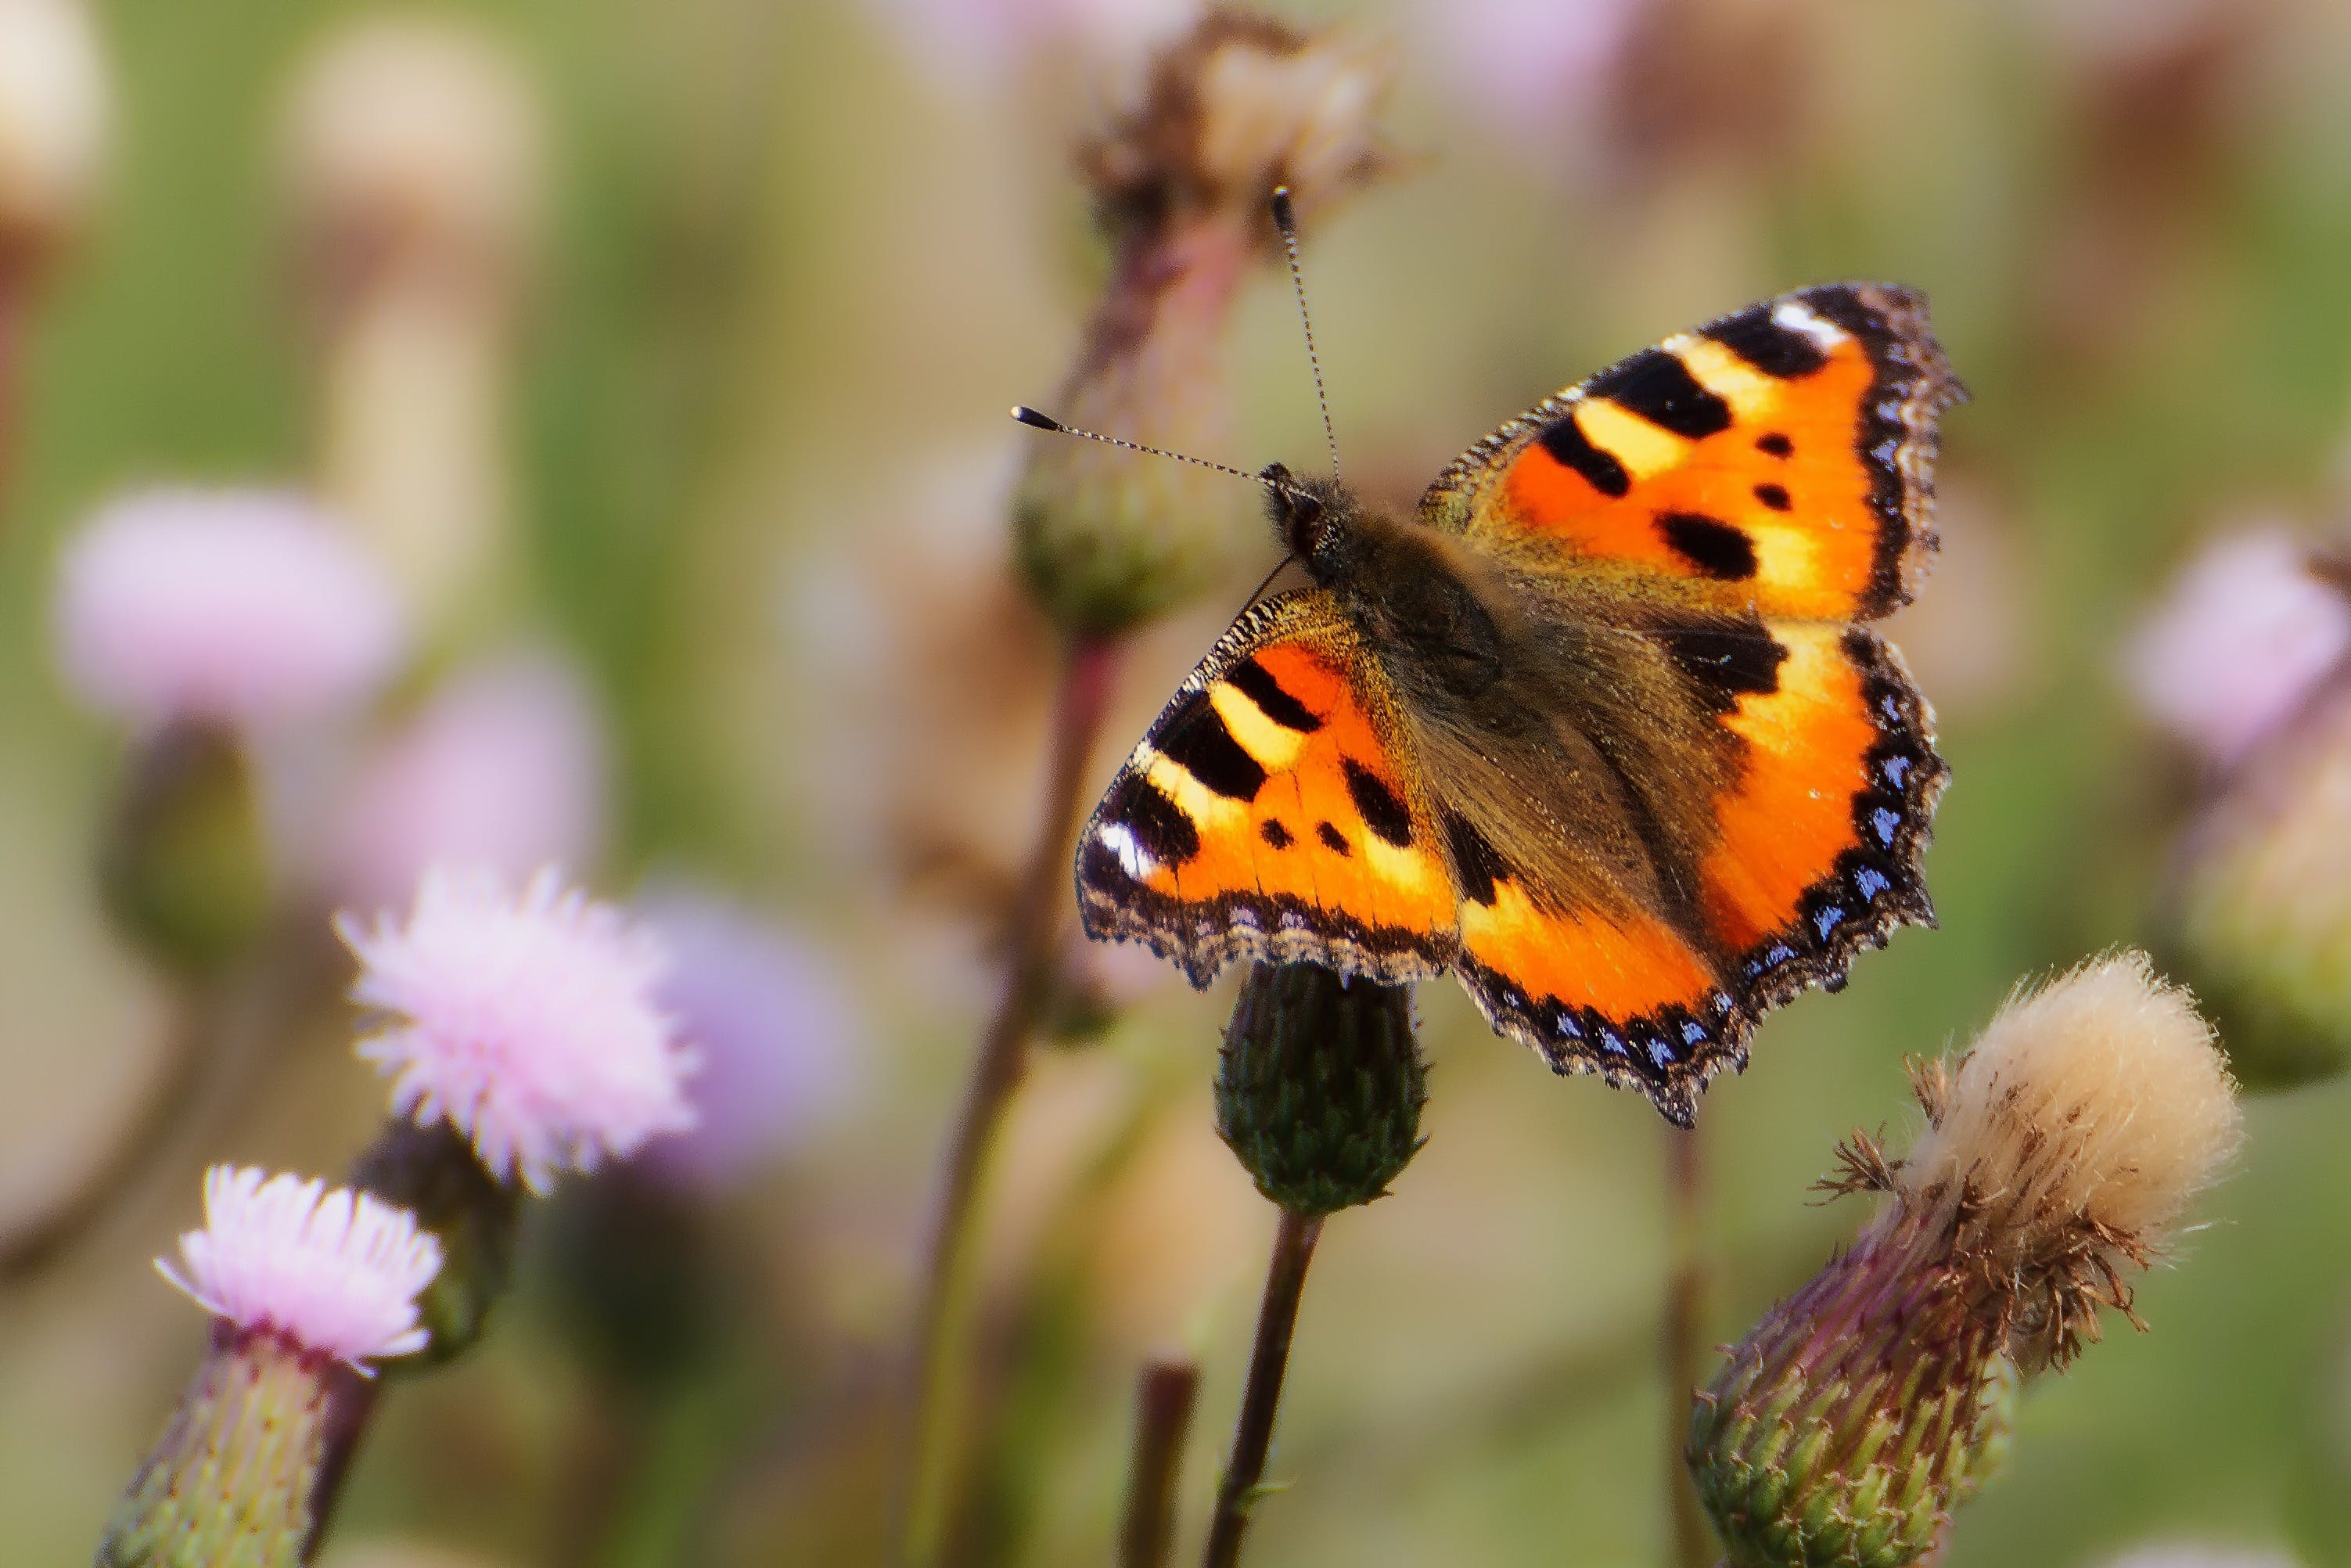 Kostenloses Stock Foto zu natur, insekt, makro, schmetterling